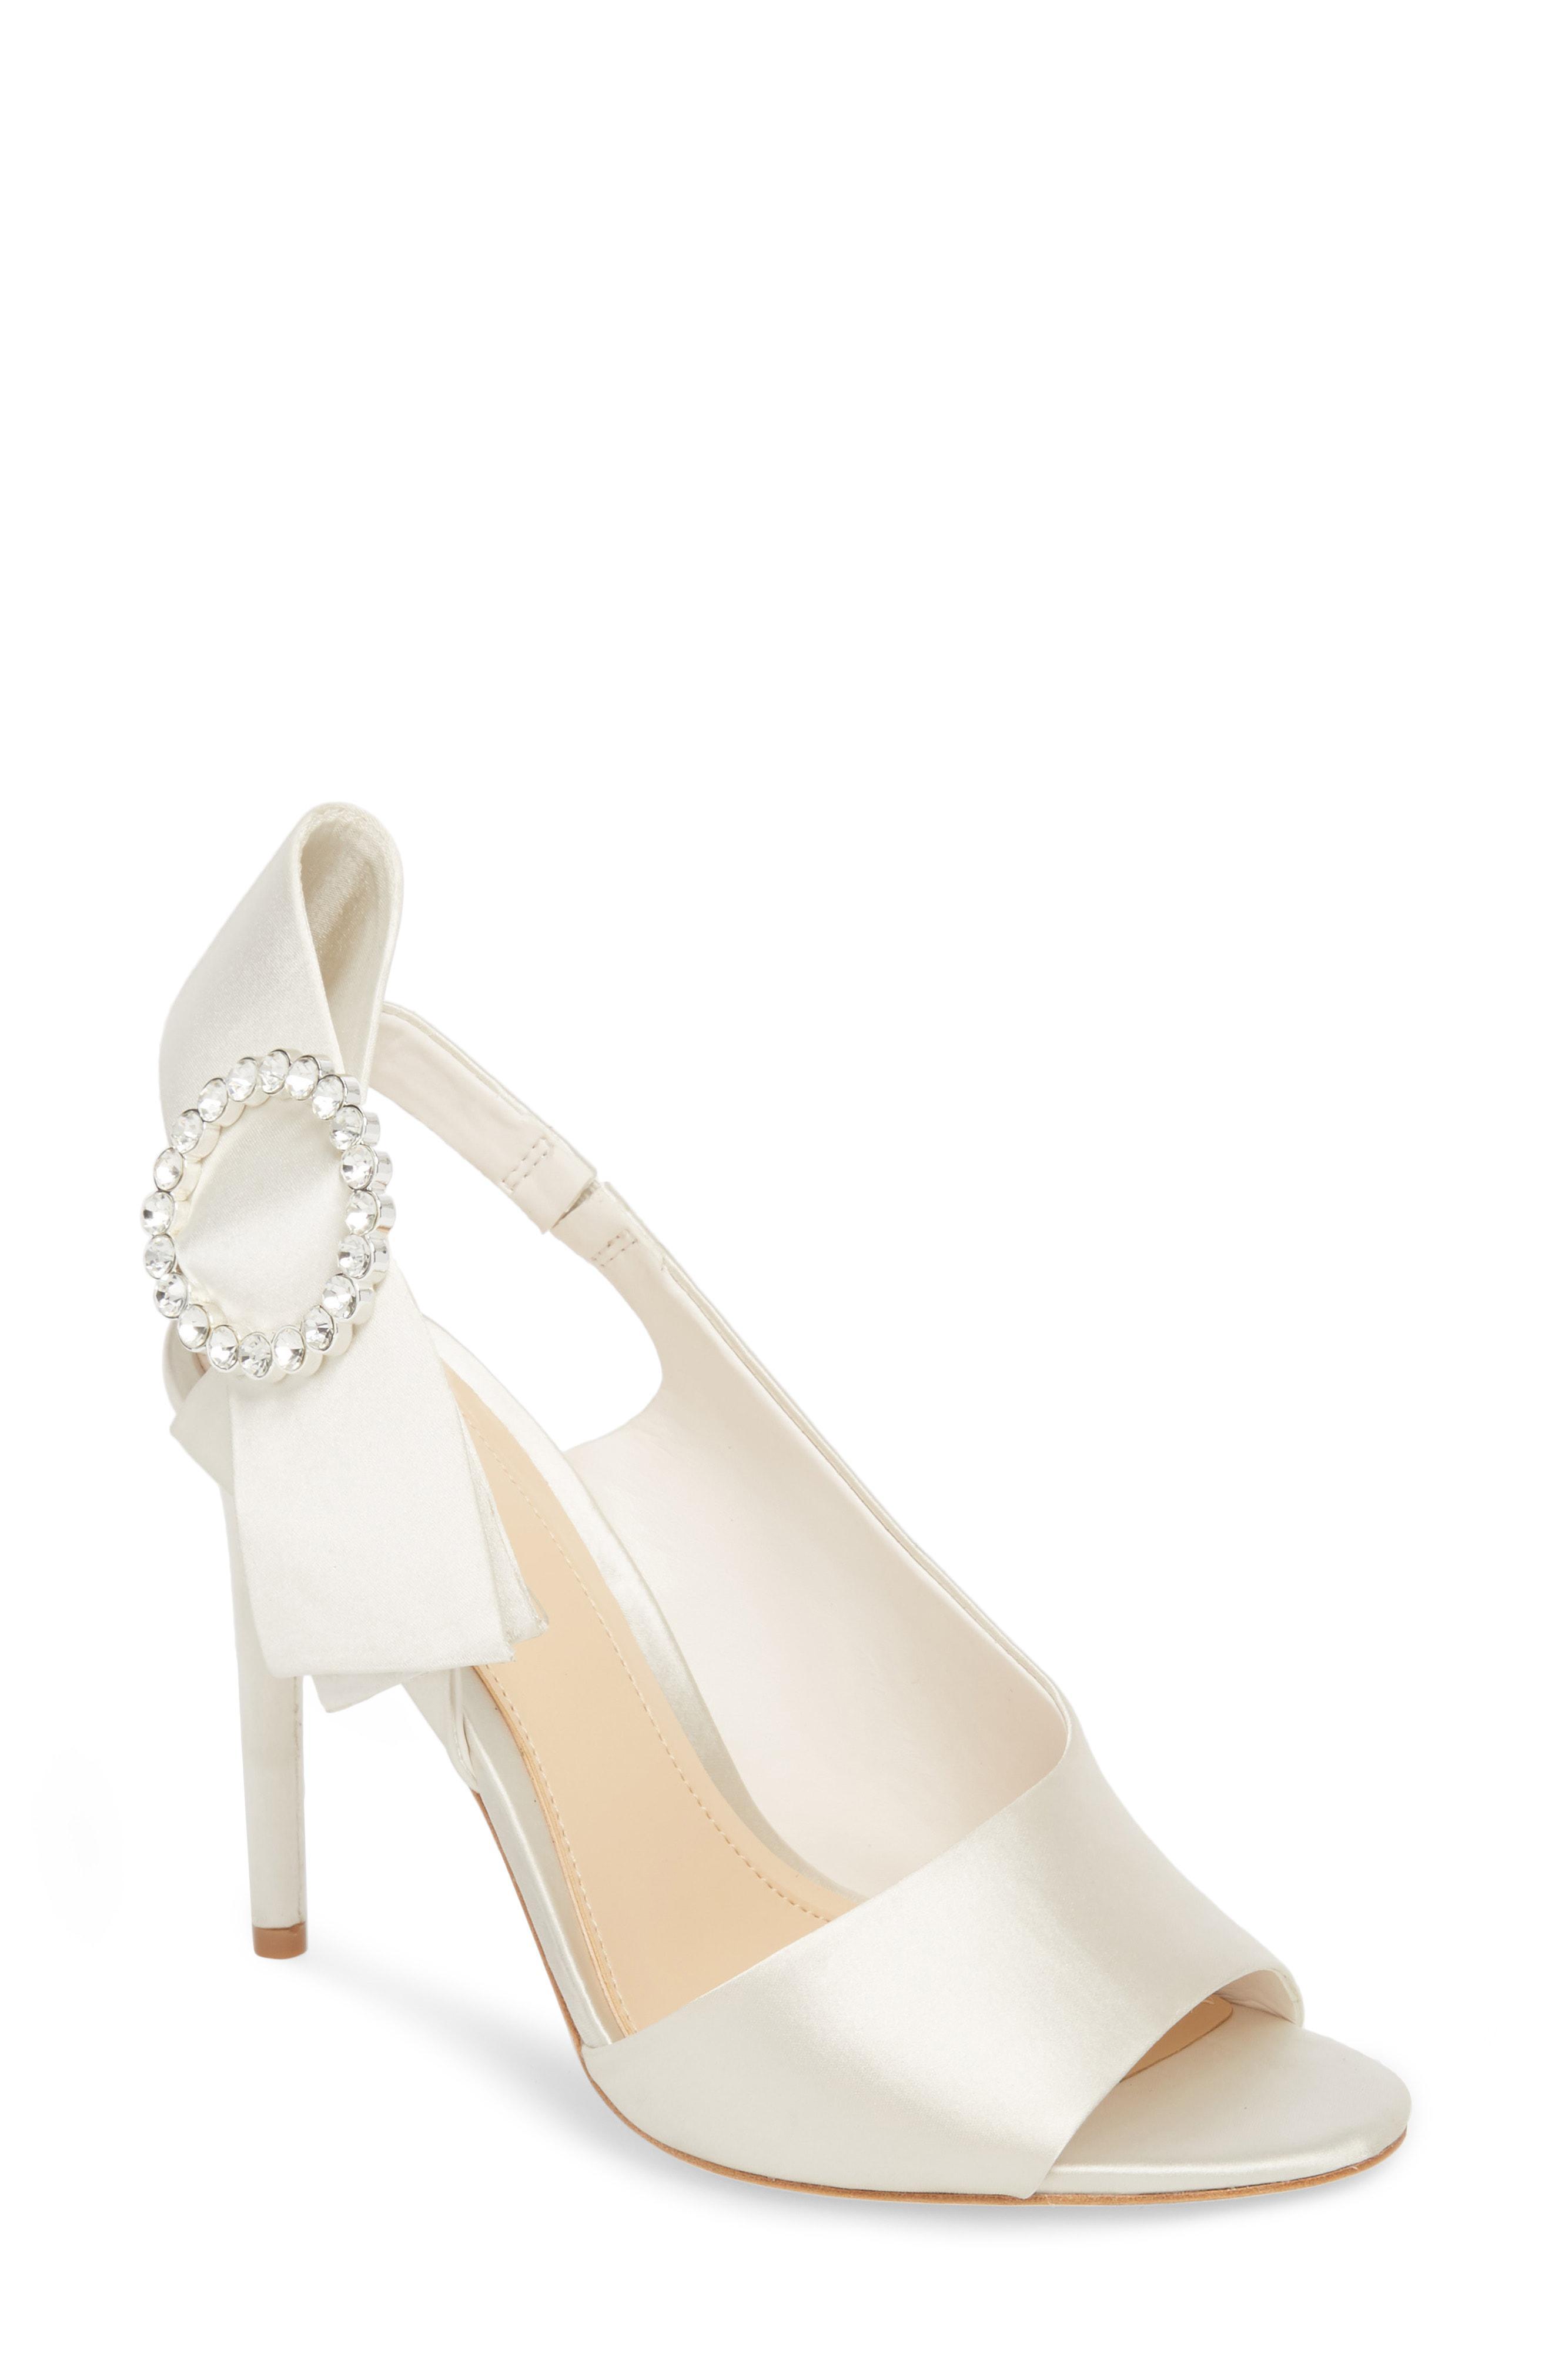 4aa6775d68bf Lyst - Imagine Vince Camuto Regin Sandal in White